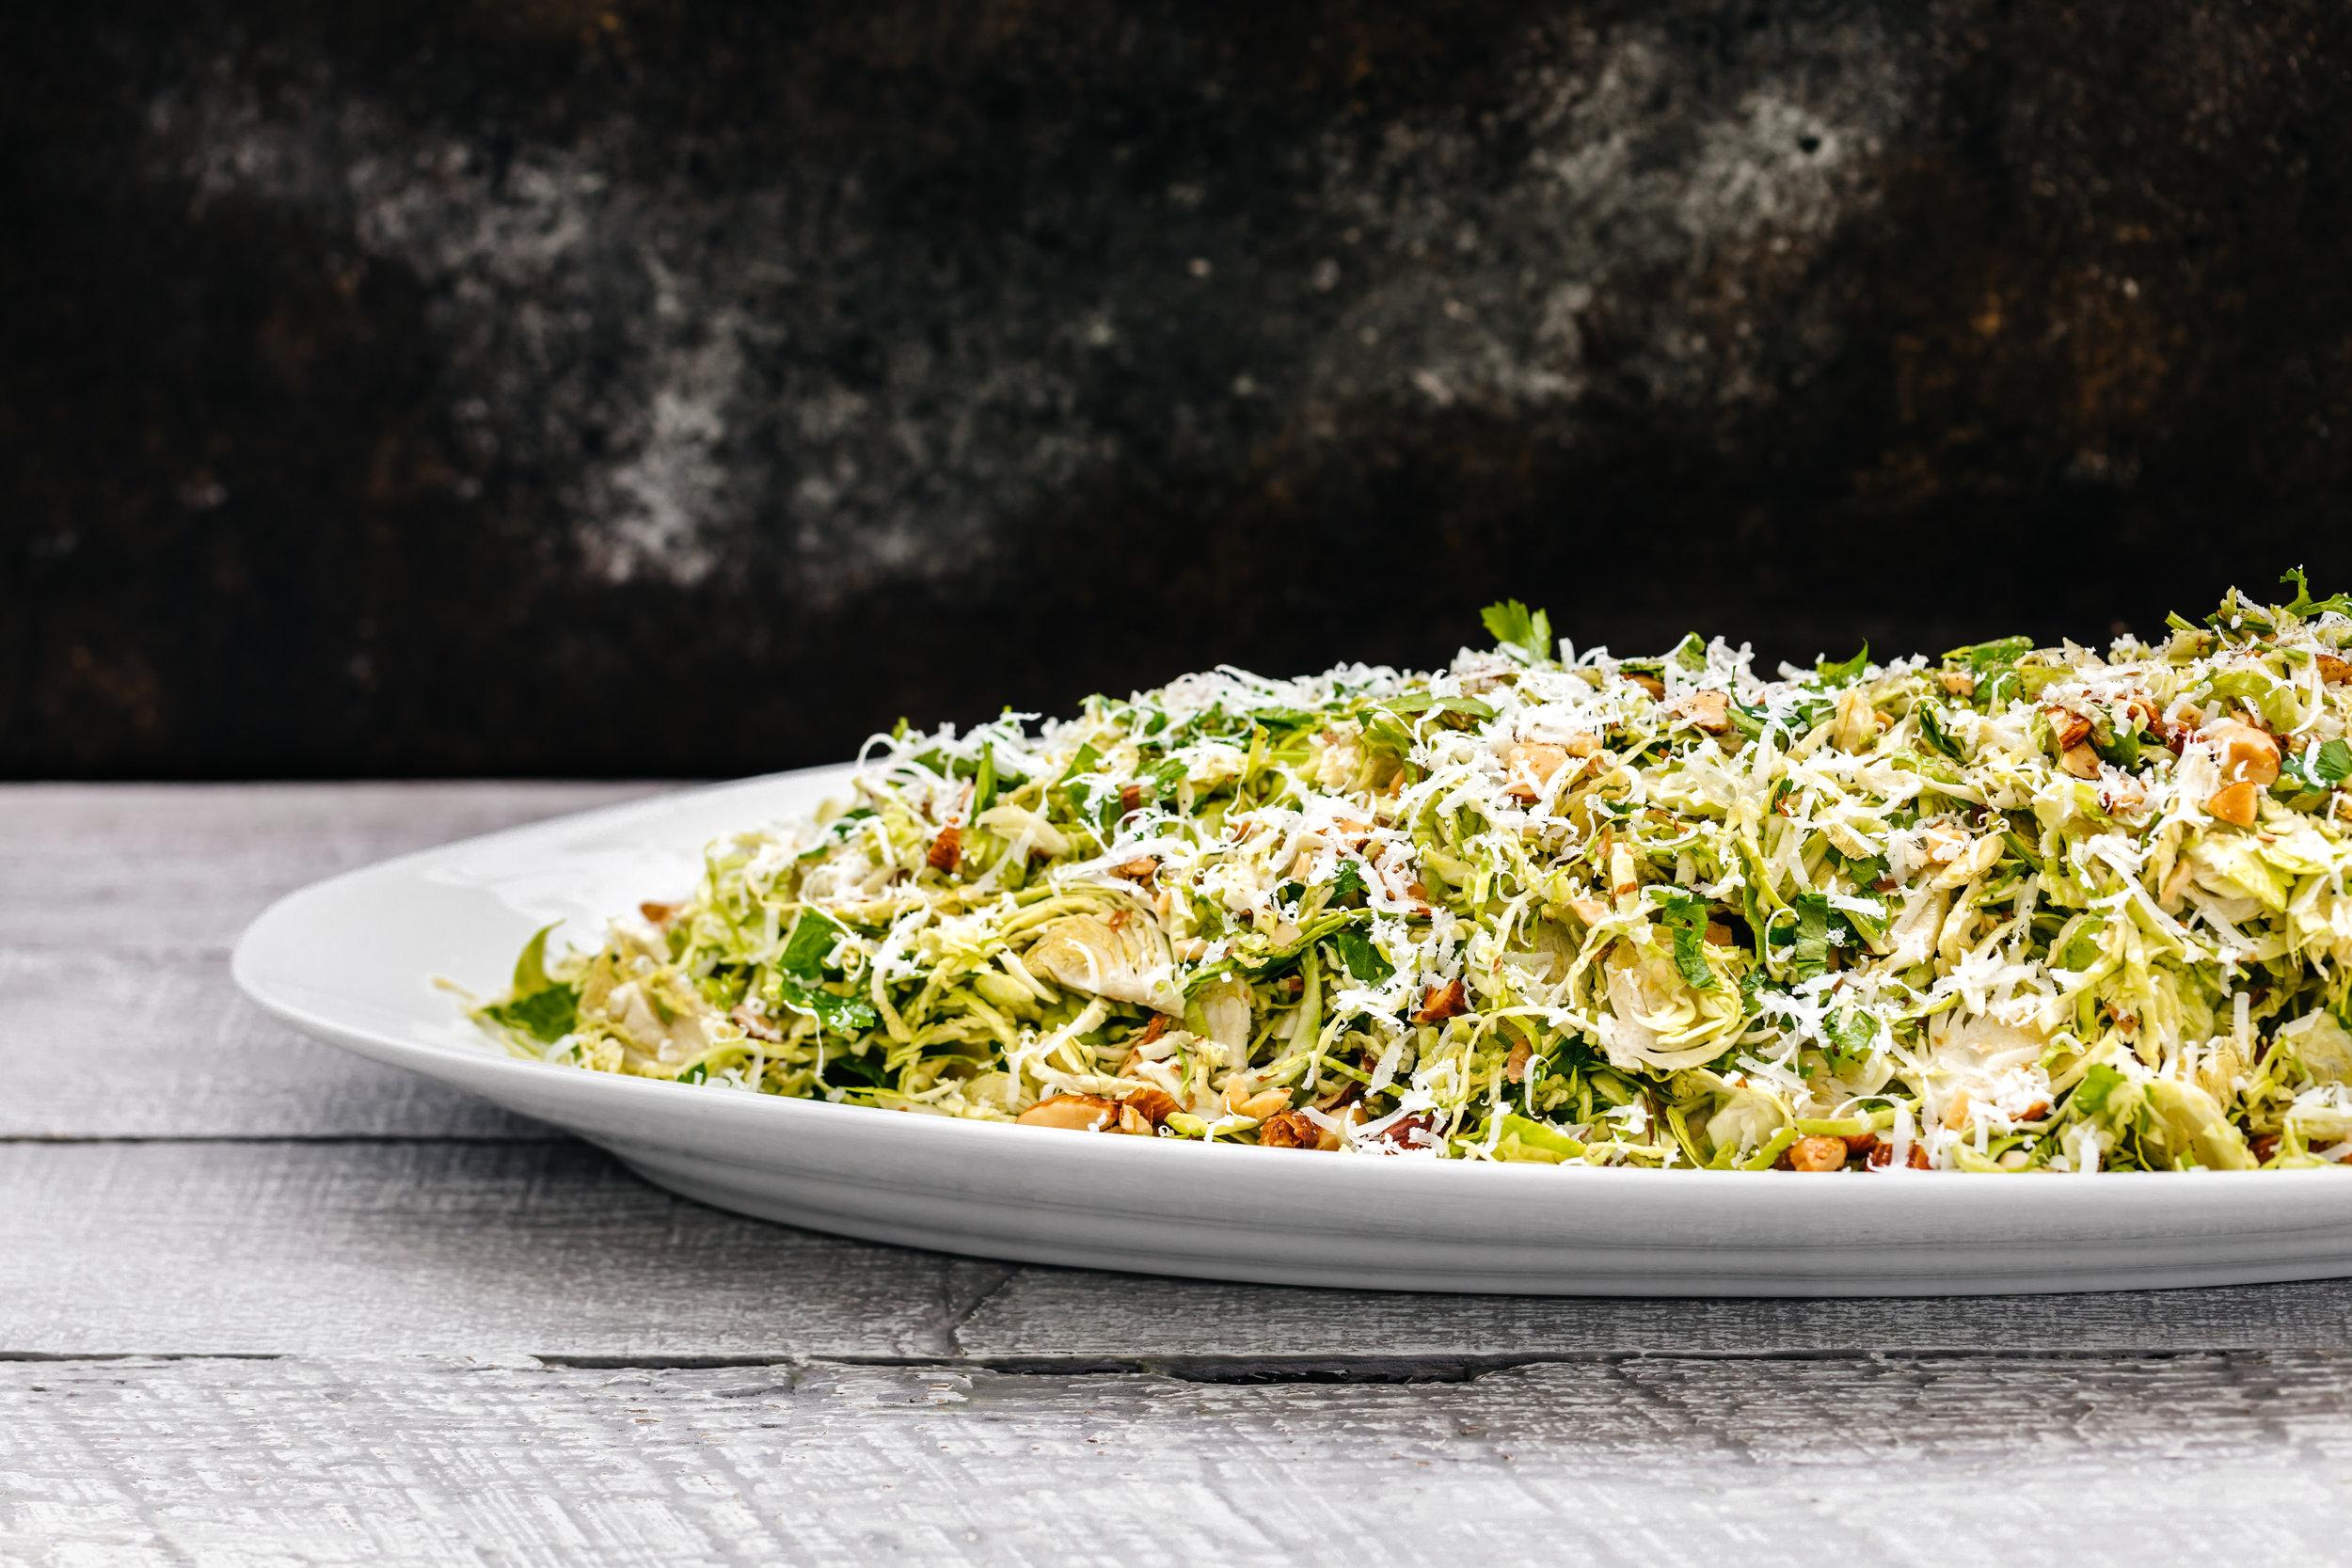 Salad Platters  Starting at $55 (serves 12- 15)